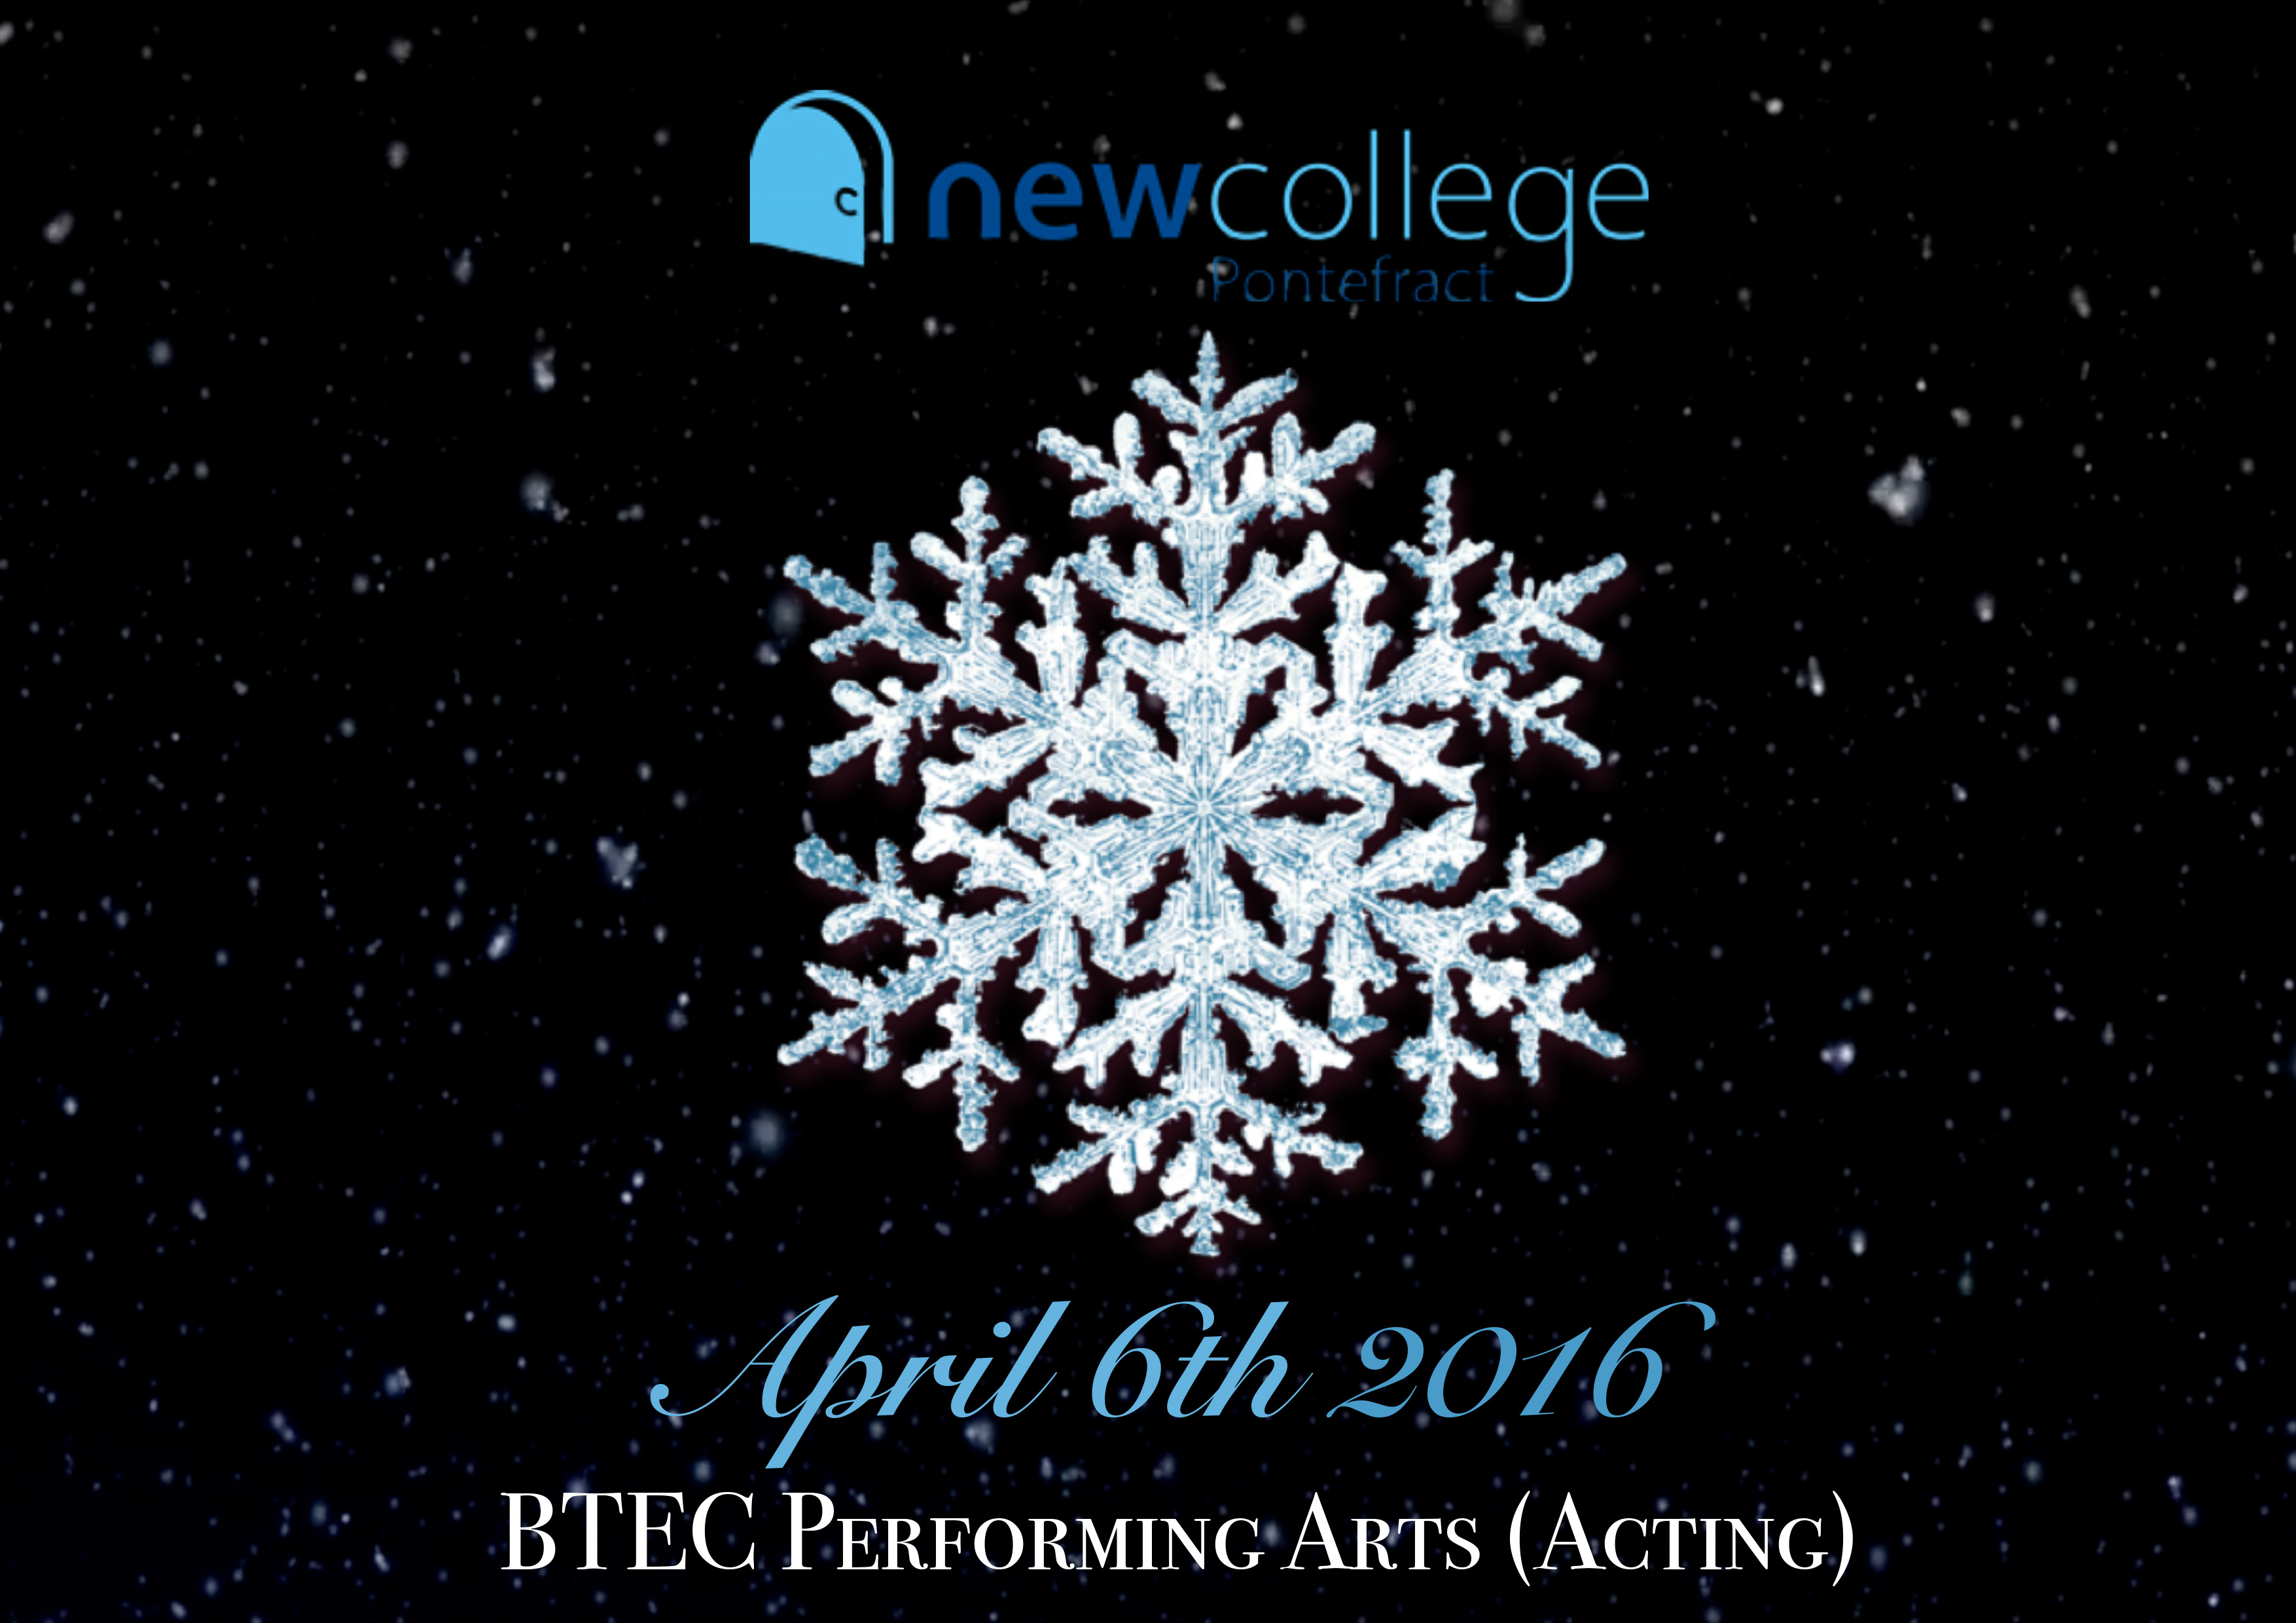 BTEC Performing Arts